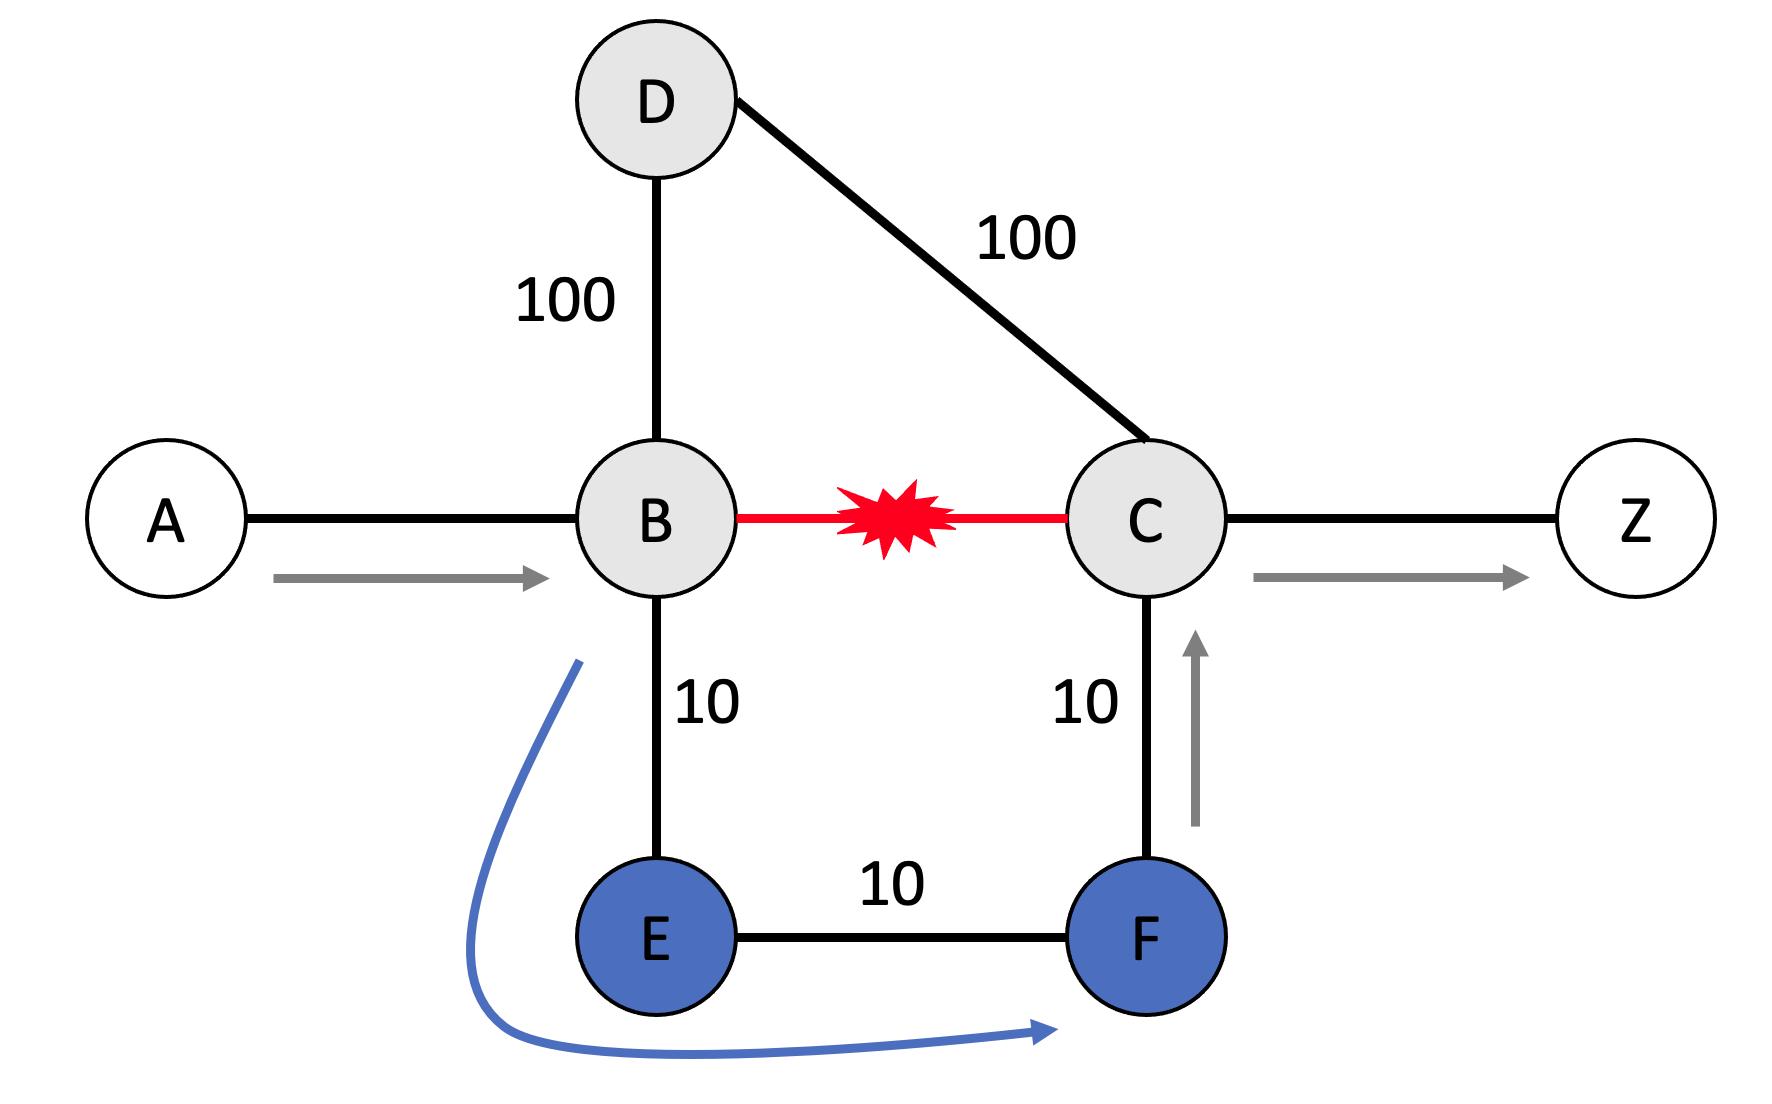 Post-convergence path